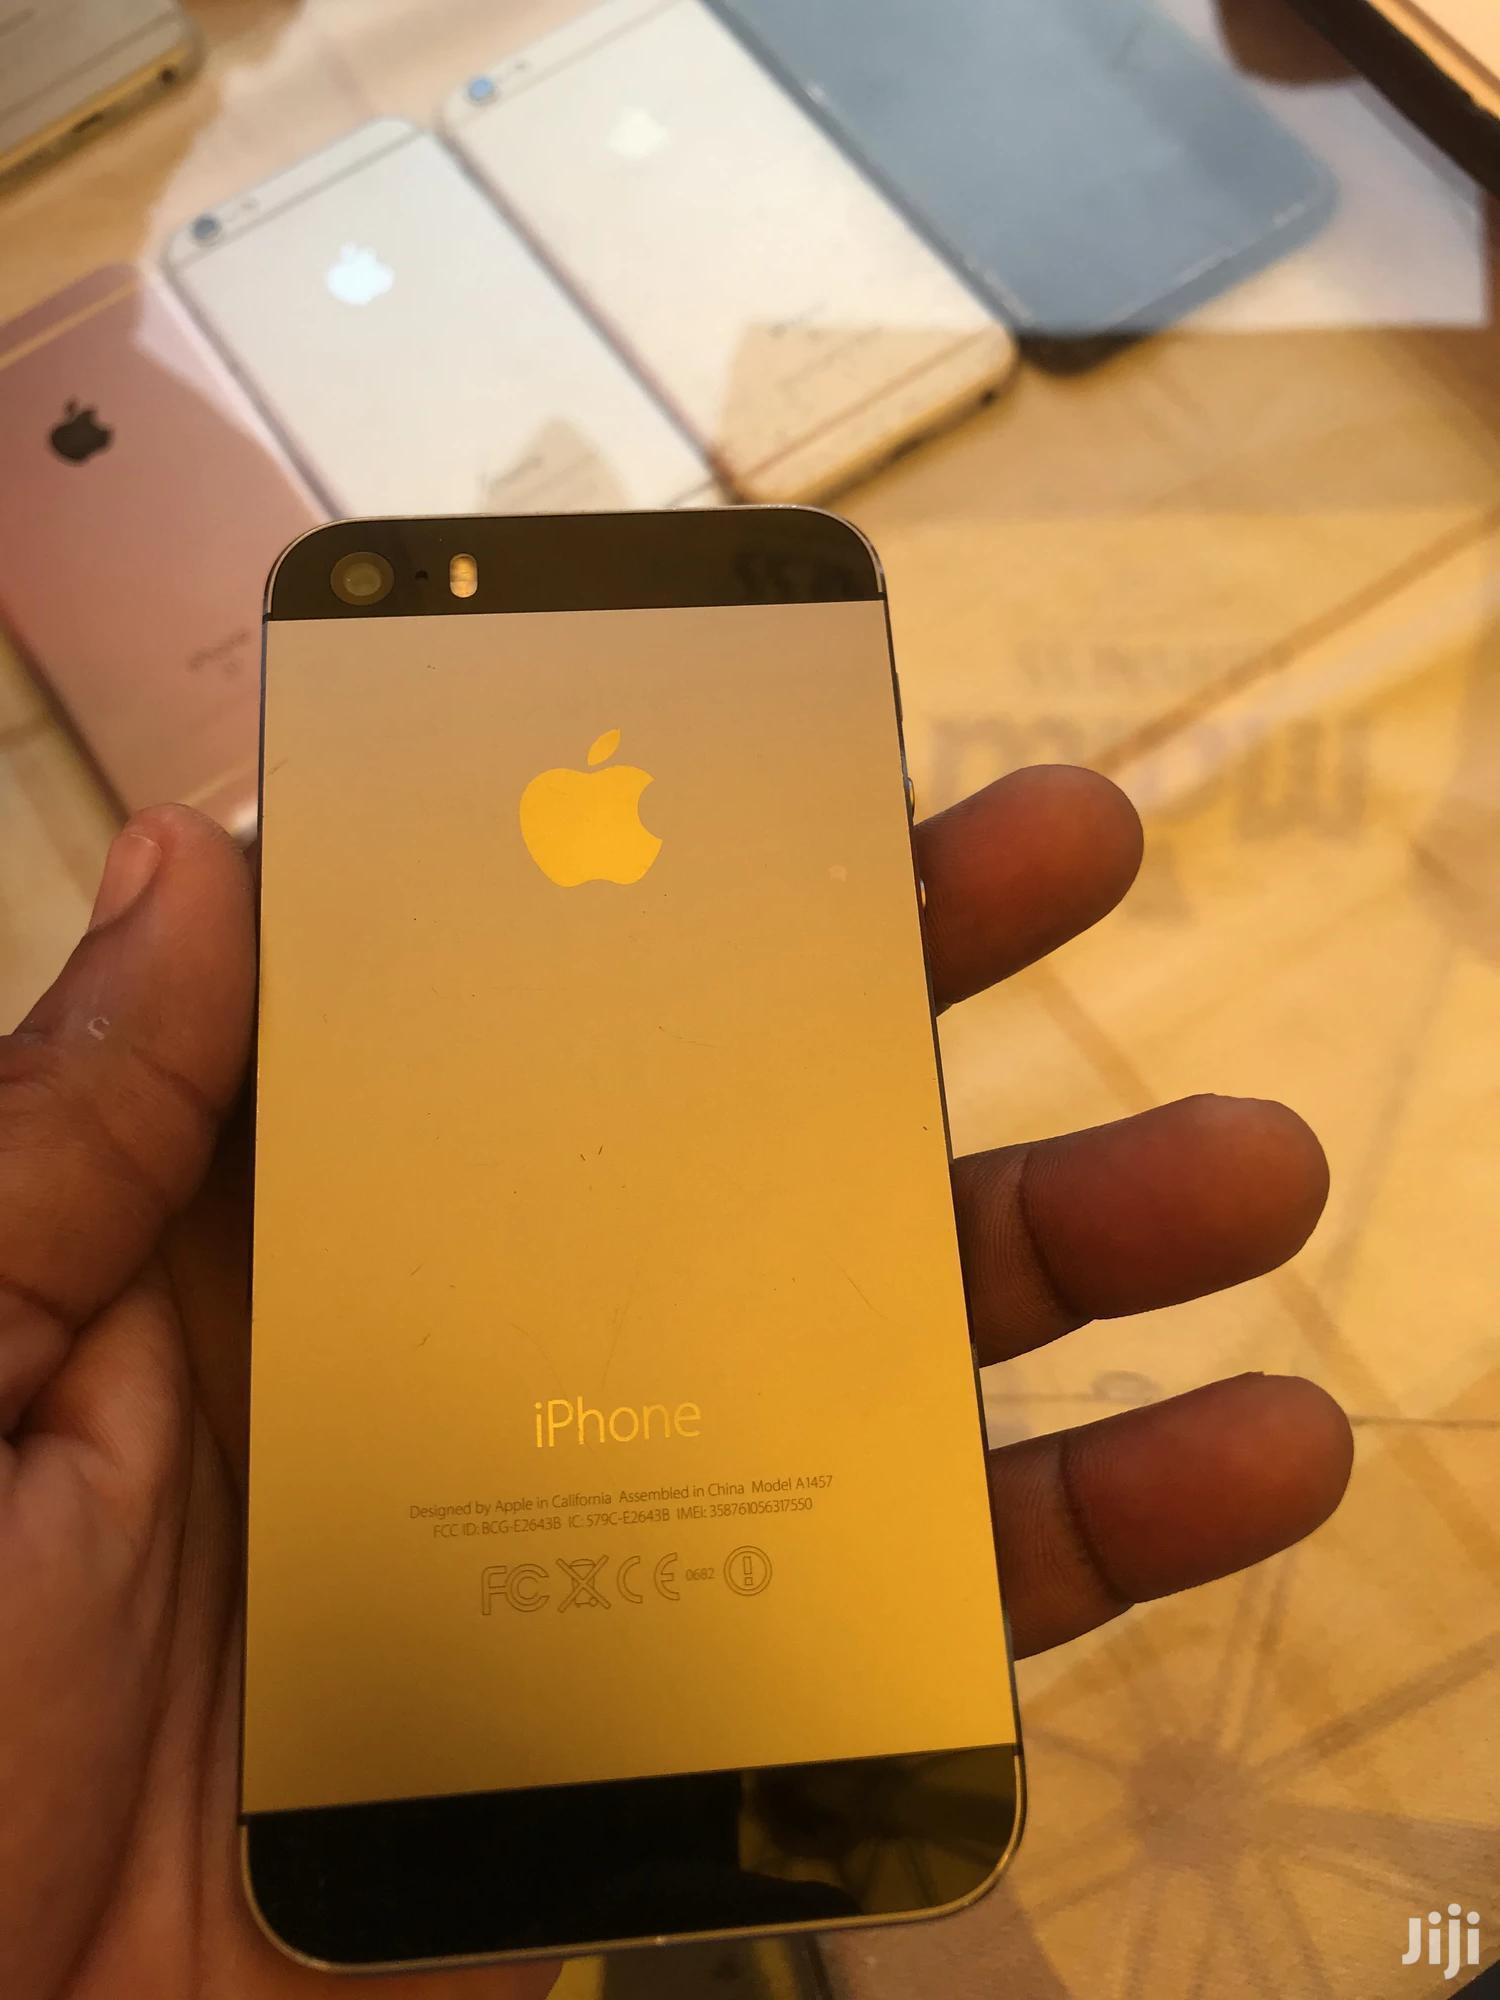 Apple iPhone 5s 16 GB Black